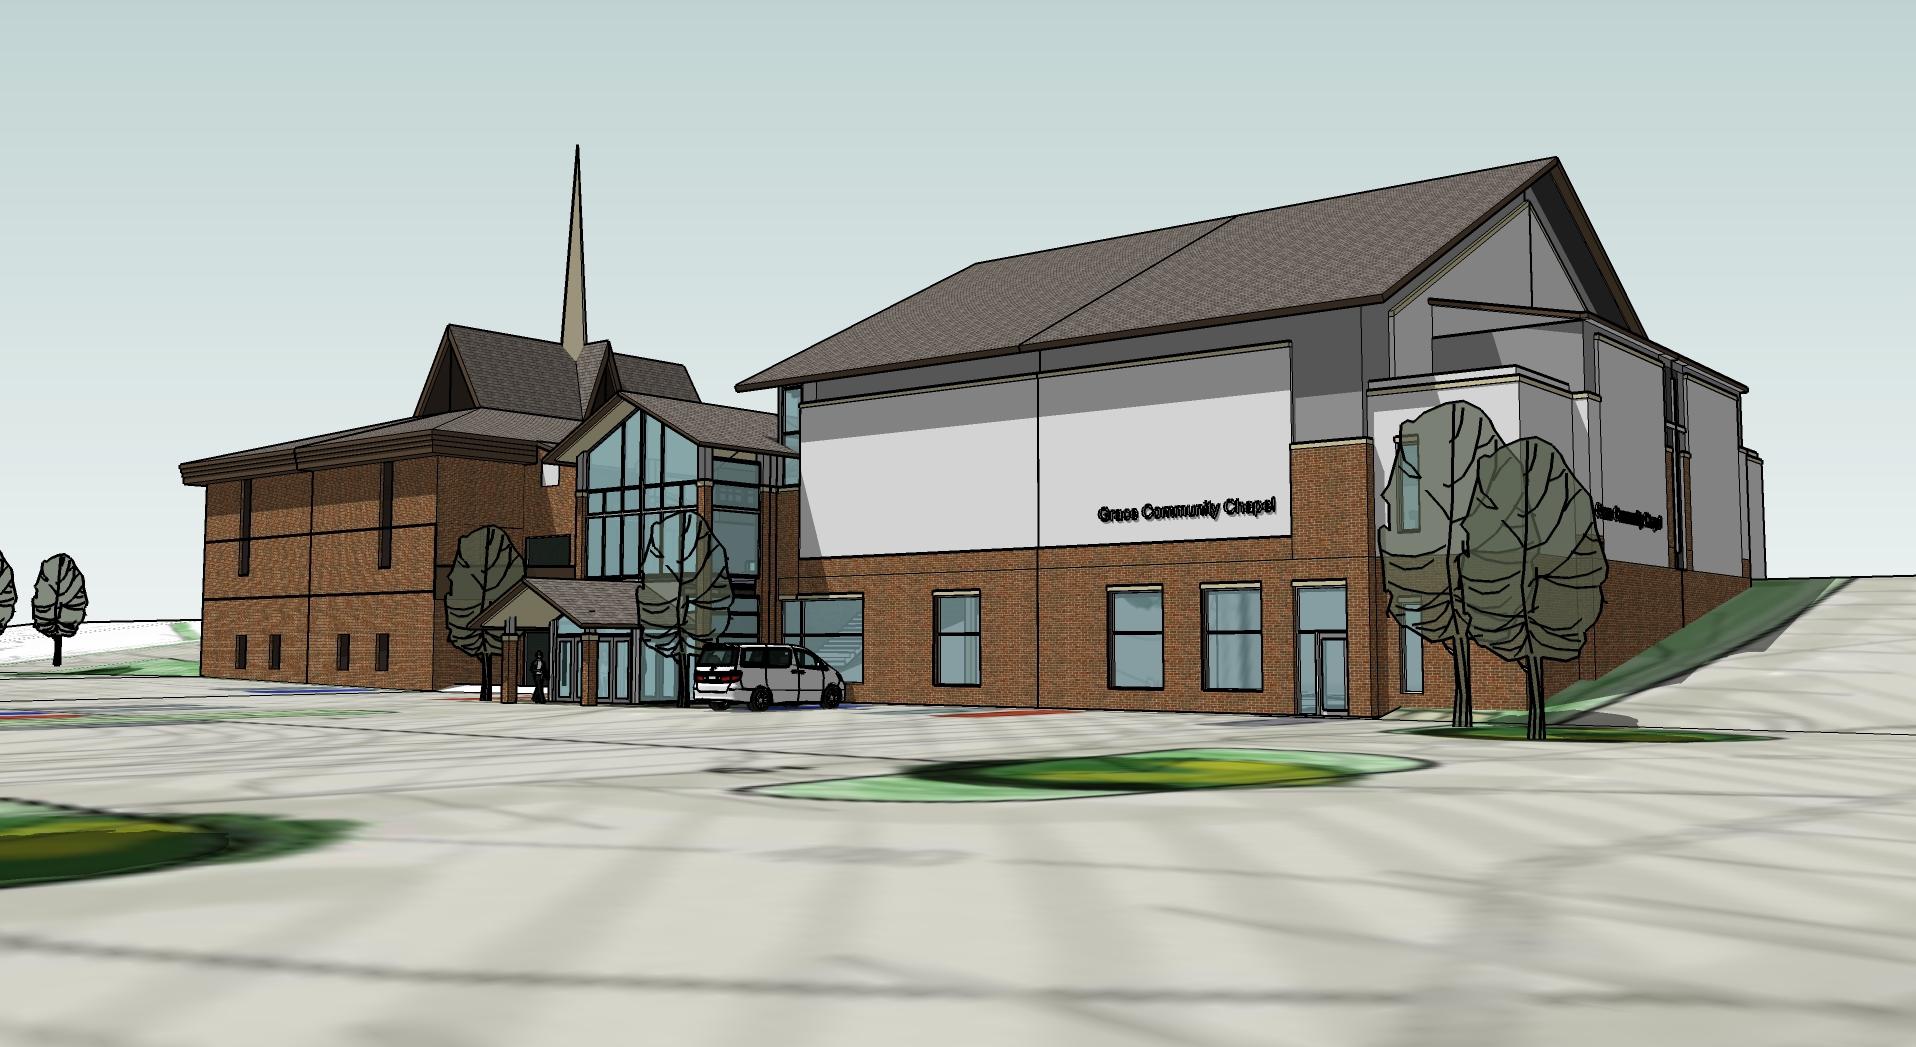 grace community chapel church 3d model.jpg